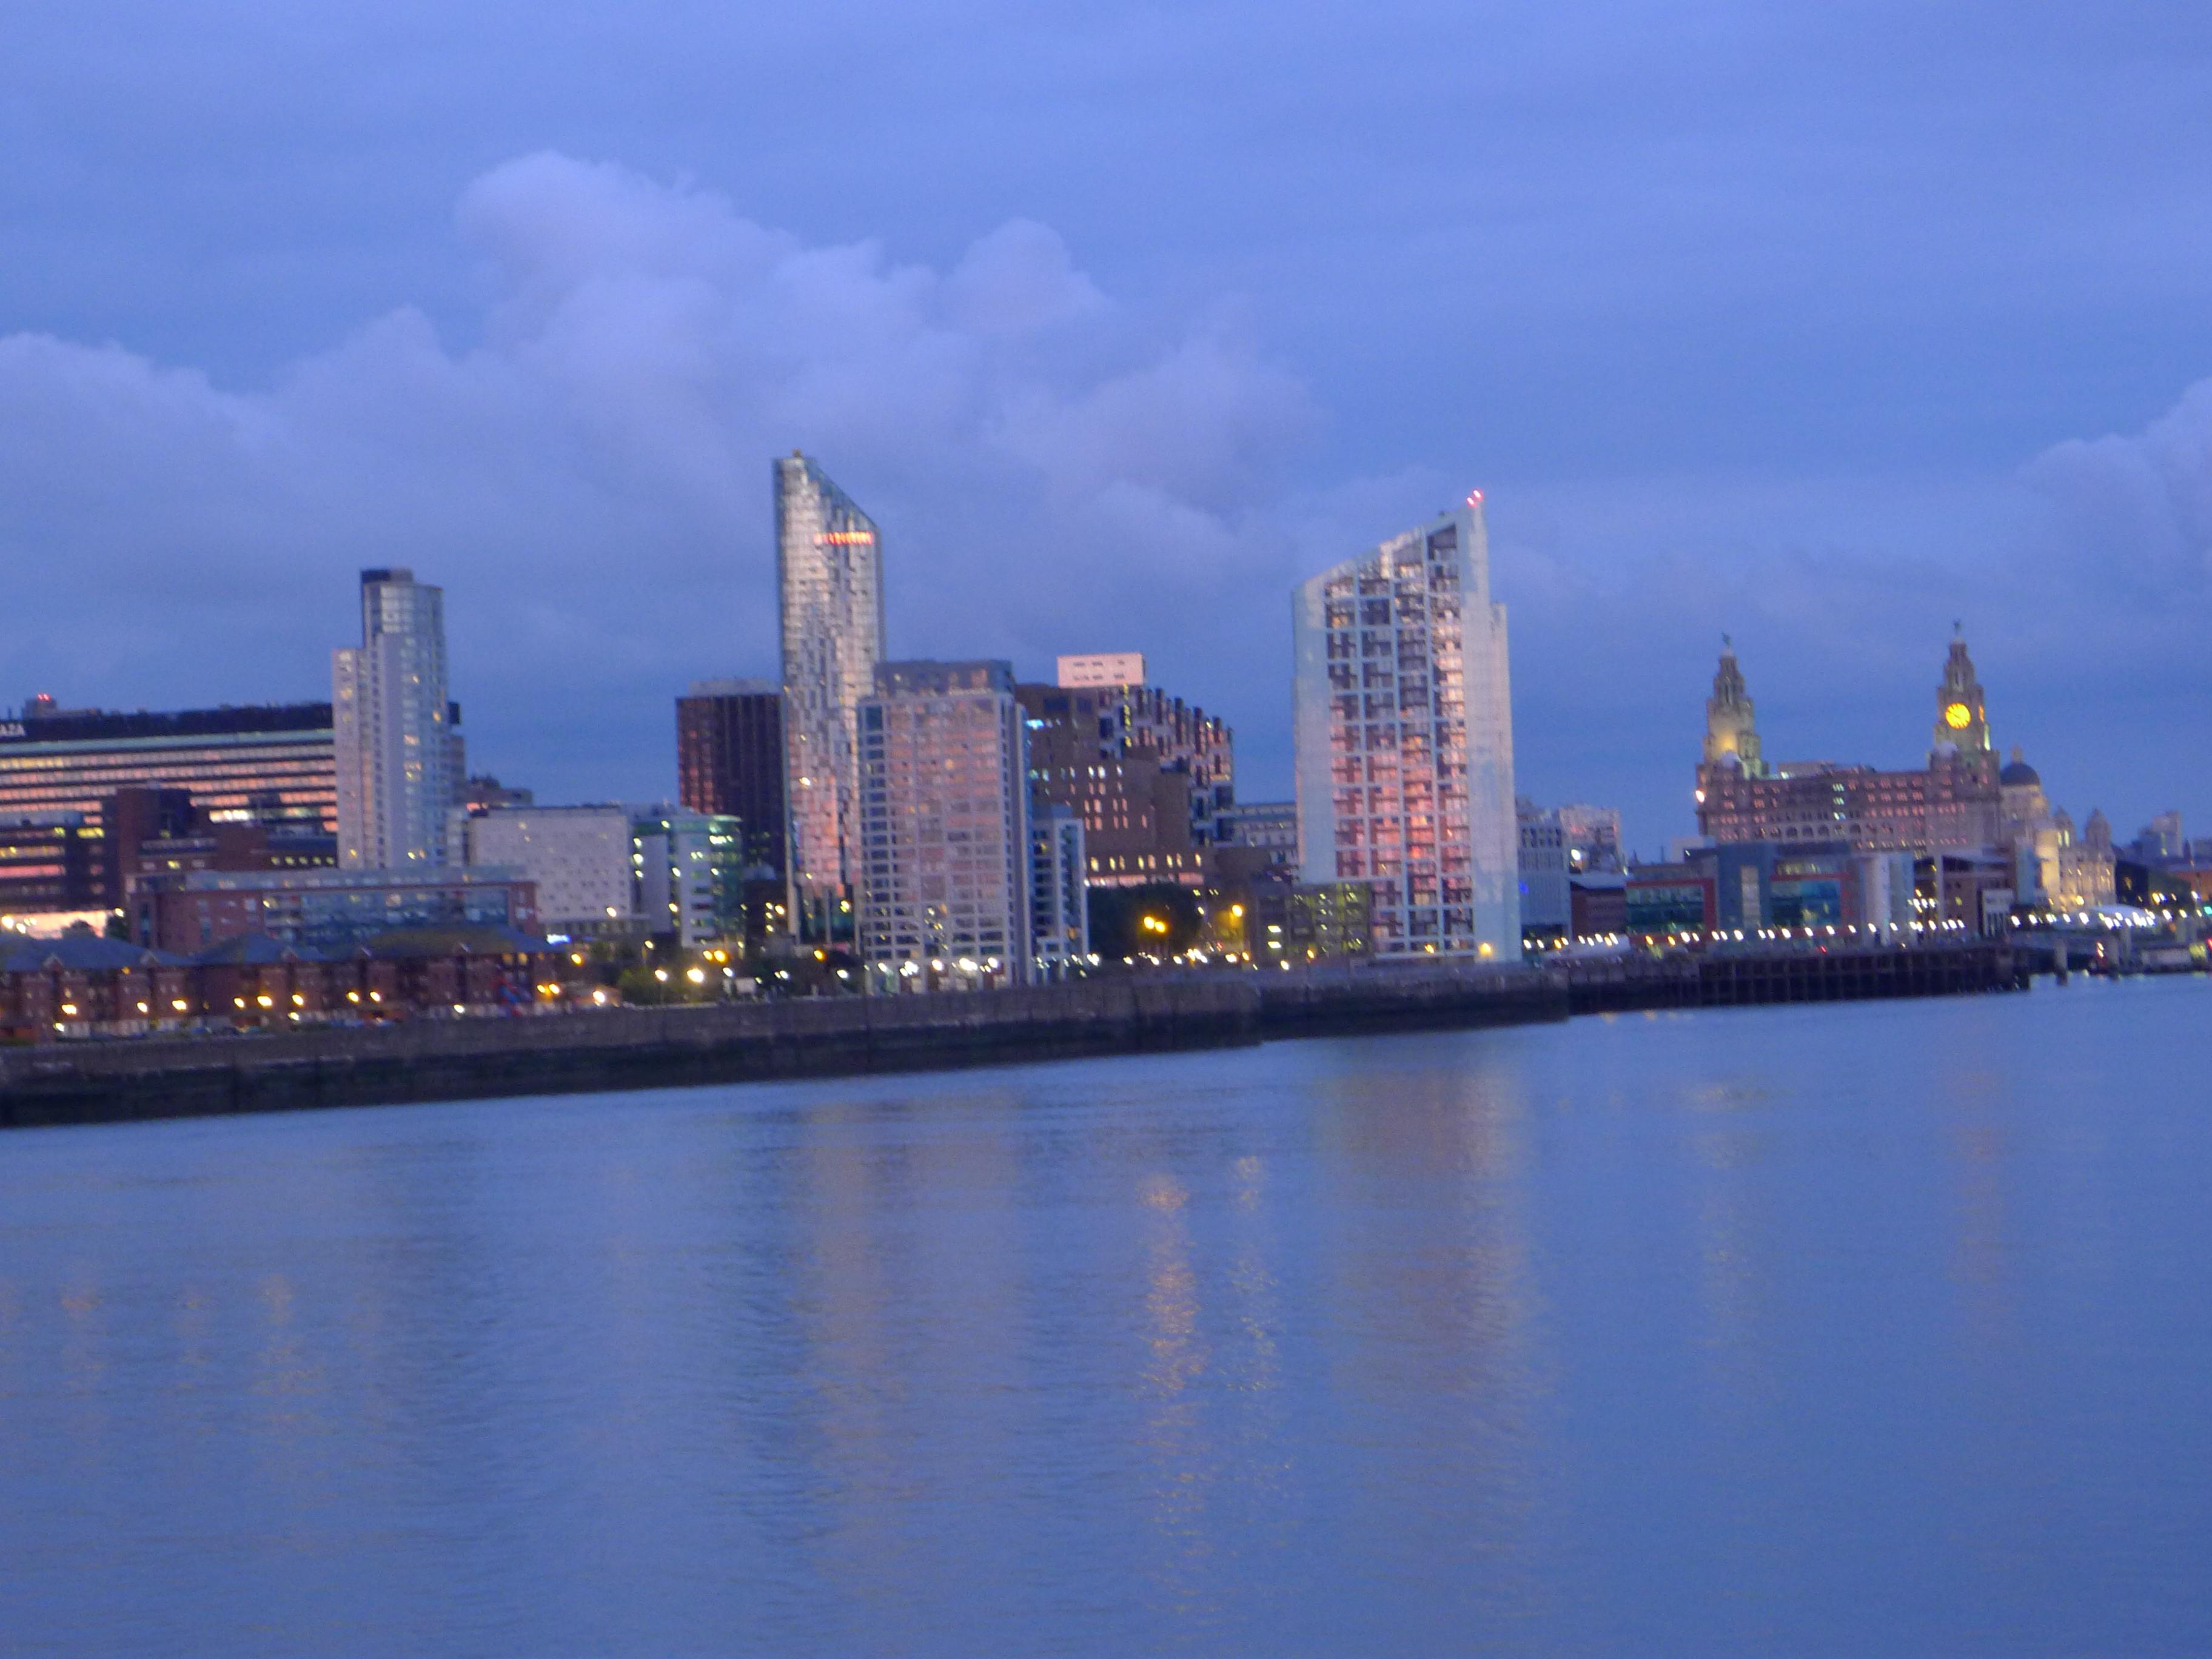 Liverpool, England - 2012 visit